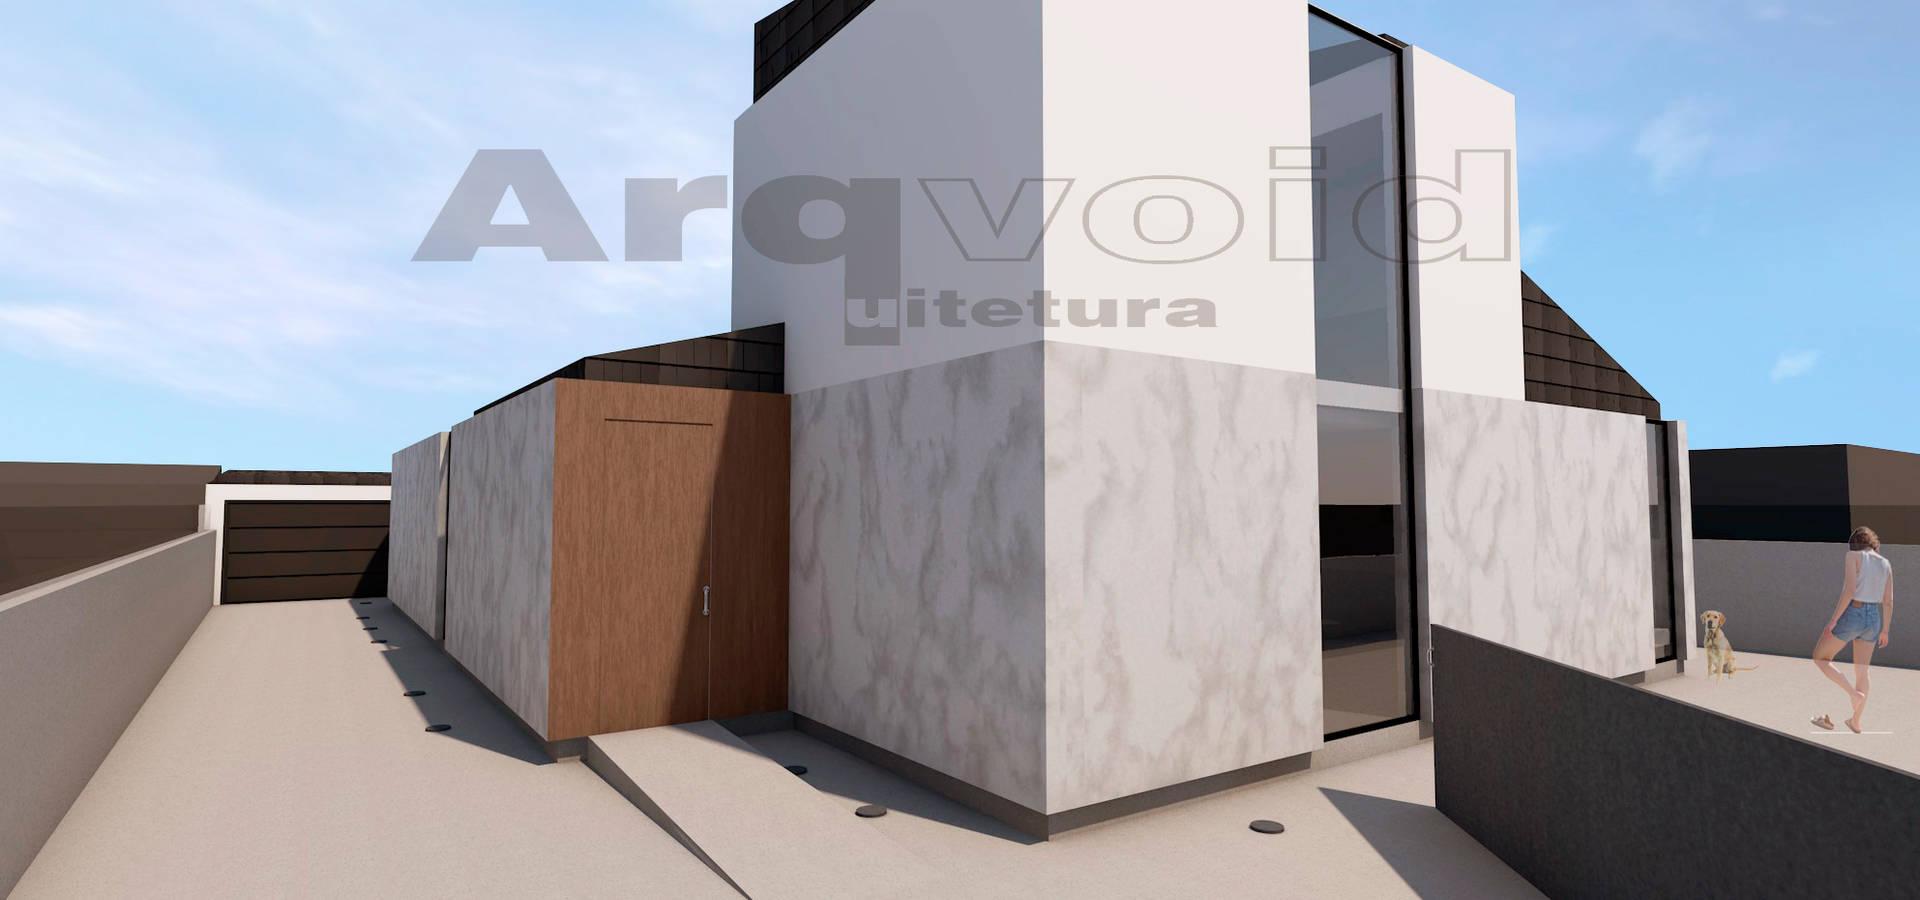 Arqvoid—Arquitetura e Serviços, Lda.